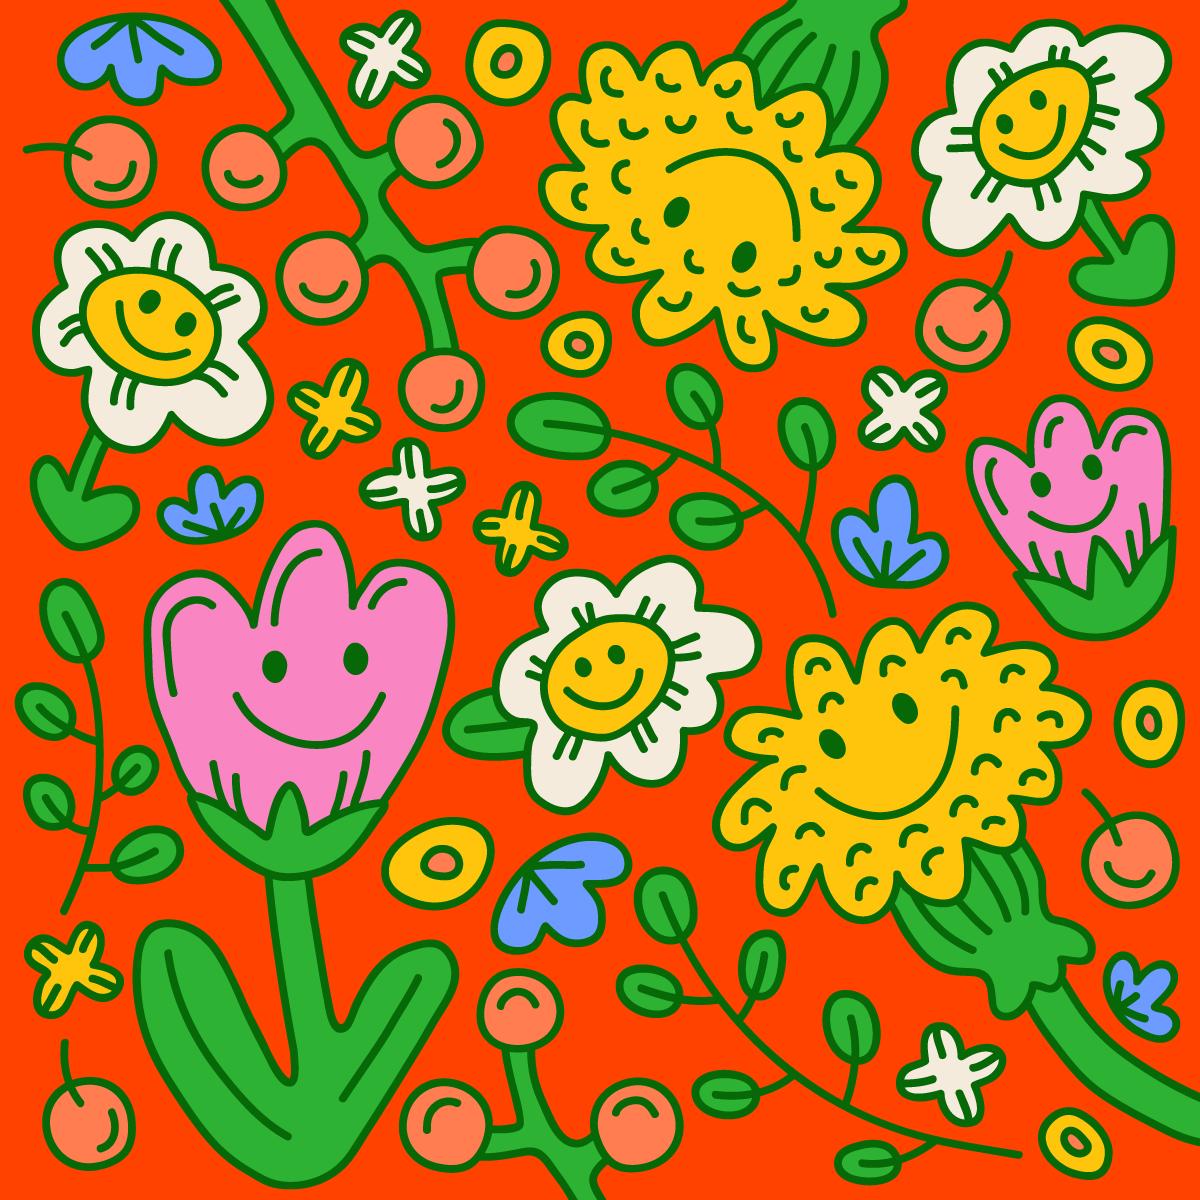 flowers-copy.png